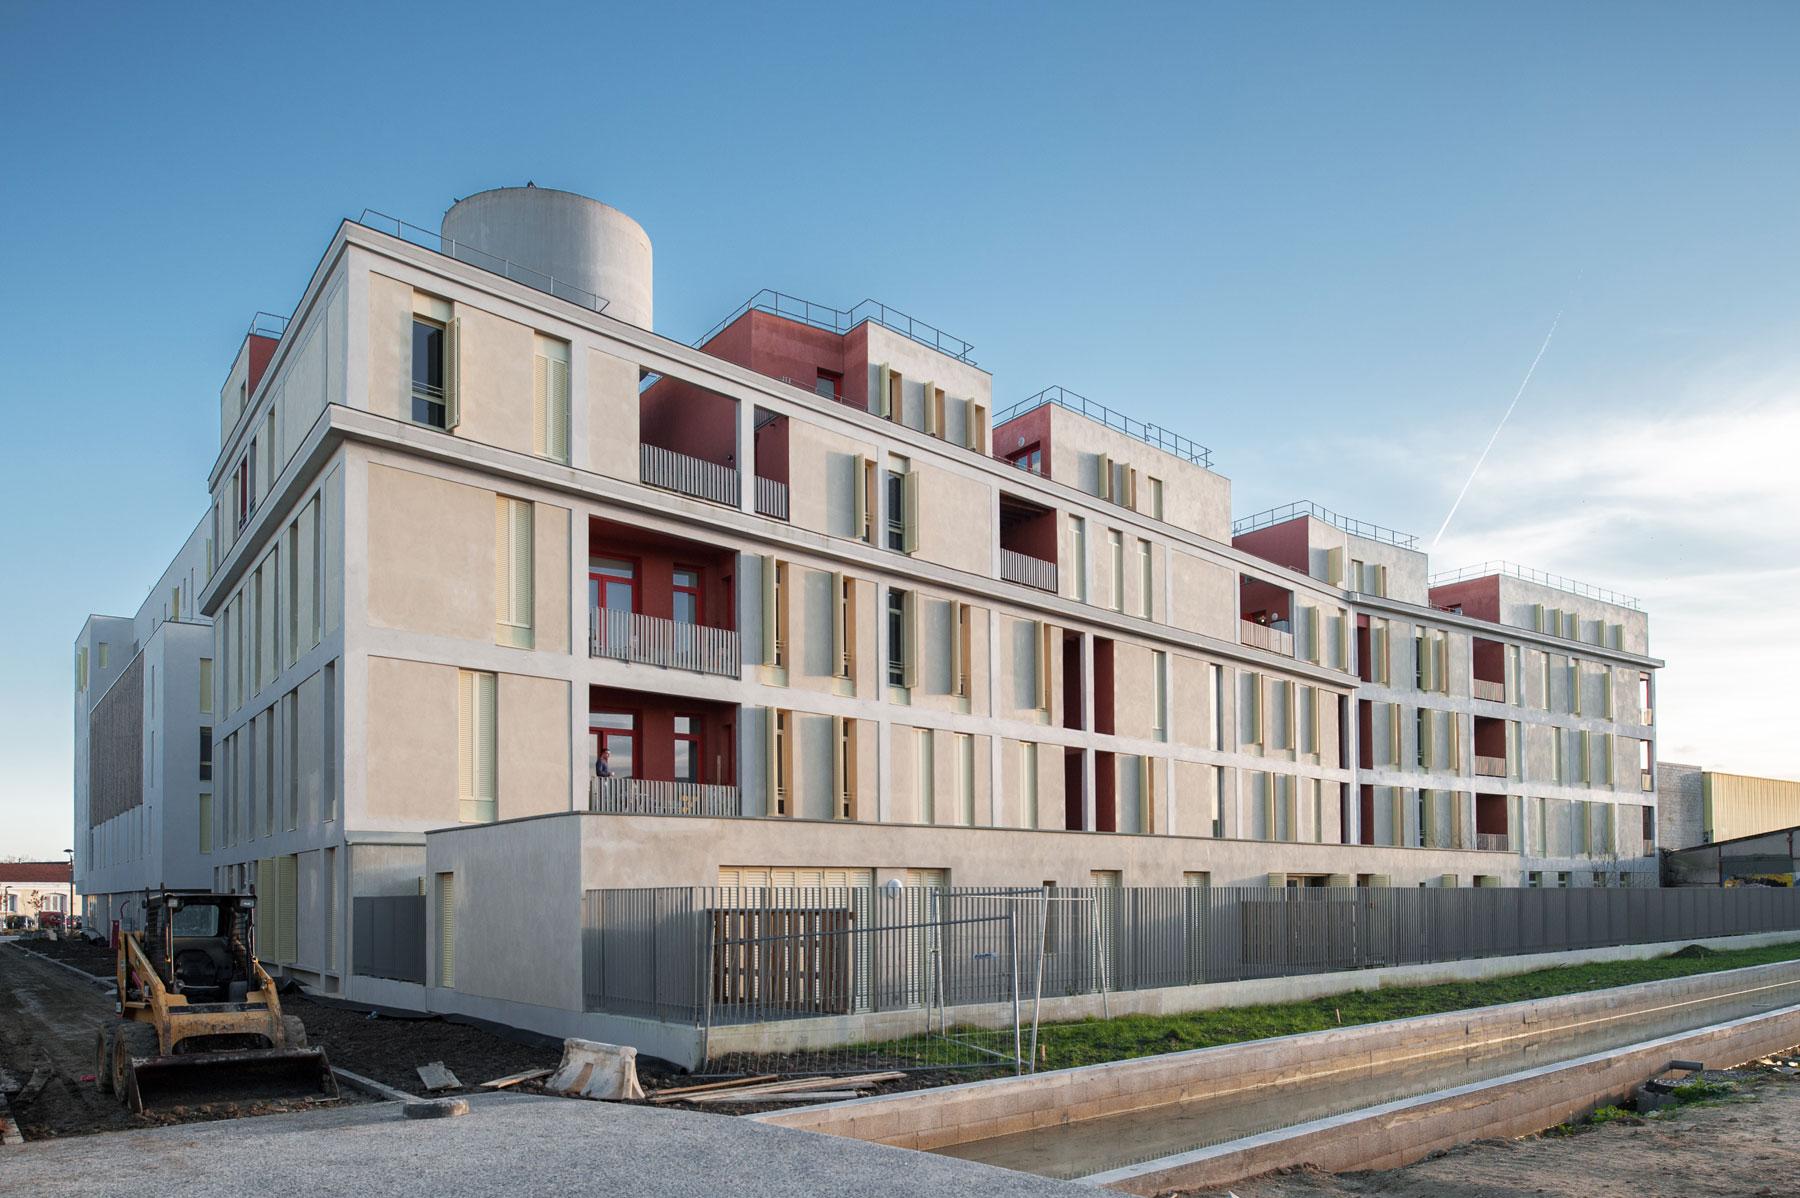 13-jam-SO2-bretigny-rehabilitation-usine-clause-facade-nord-ouest